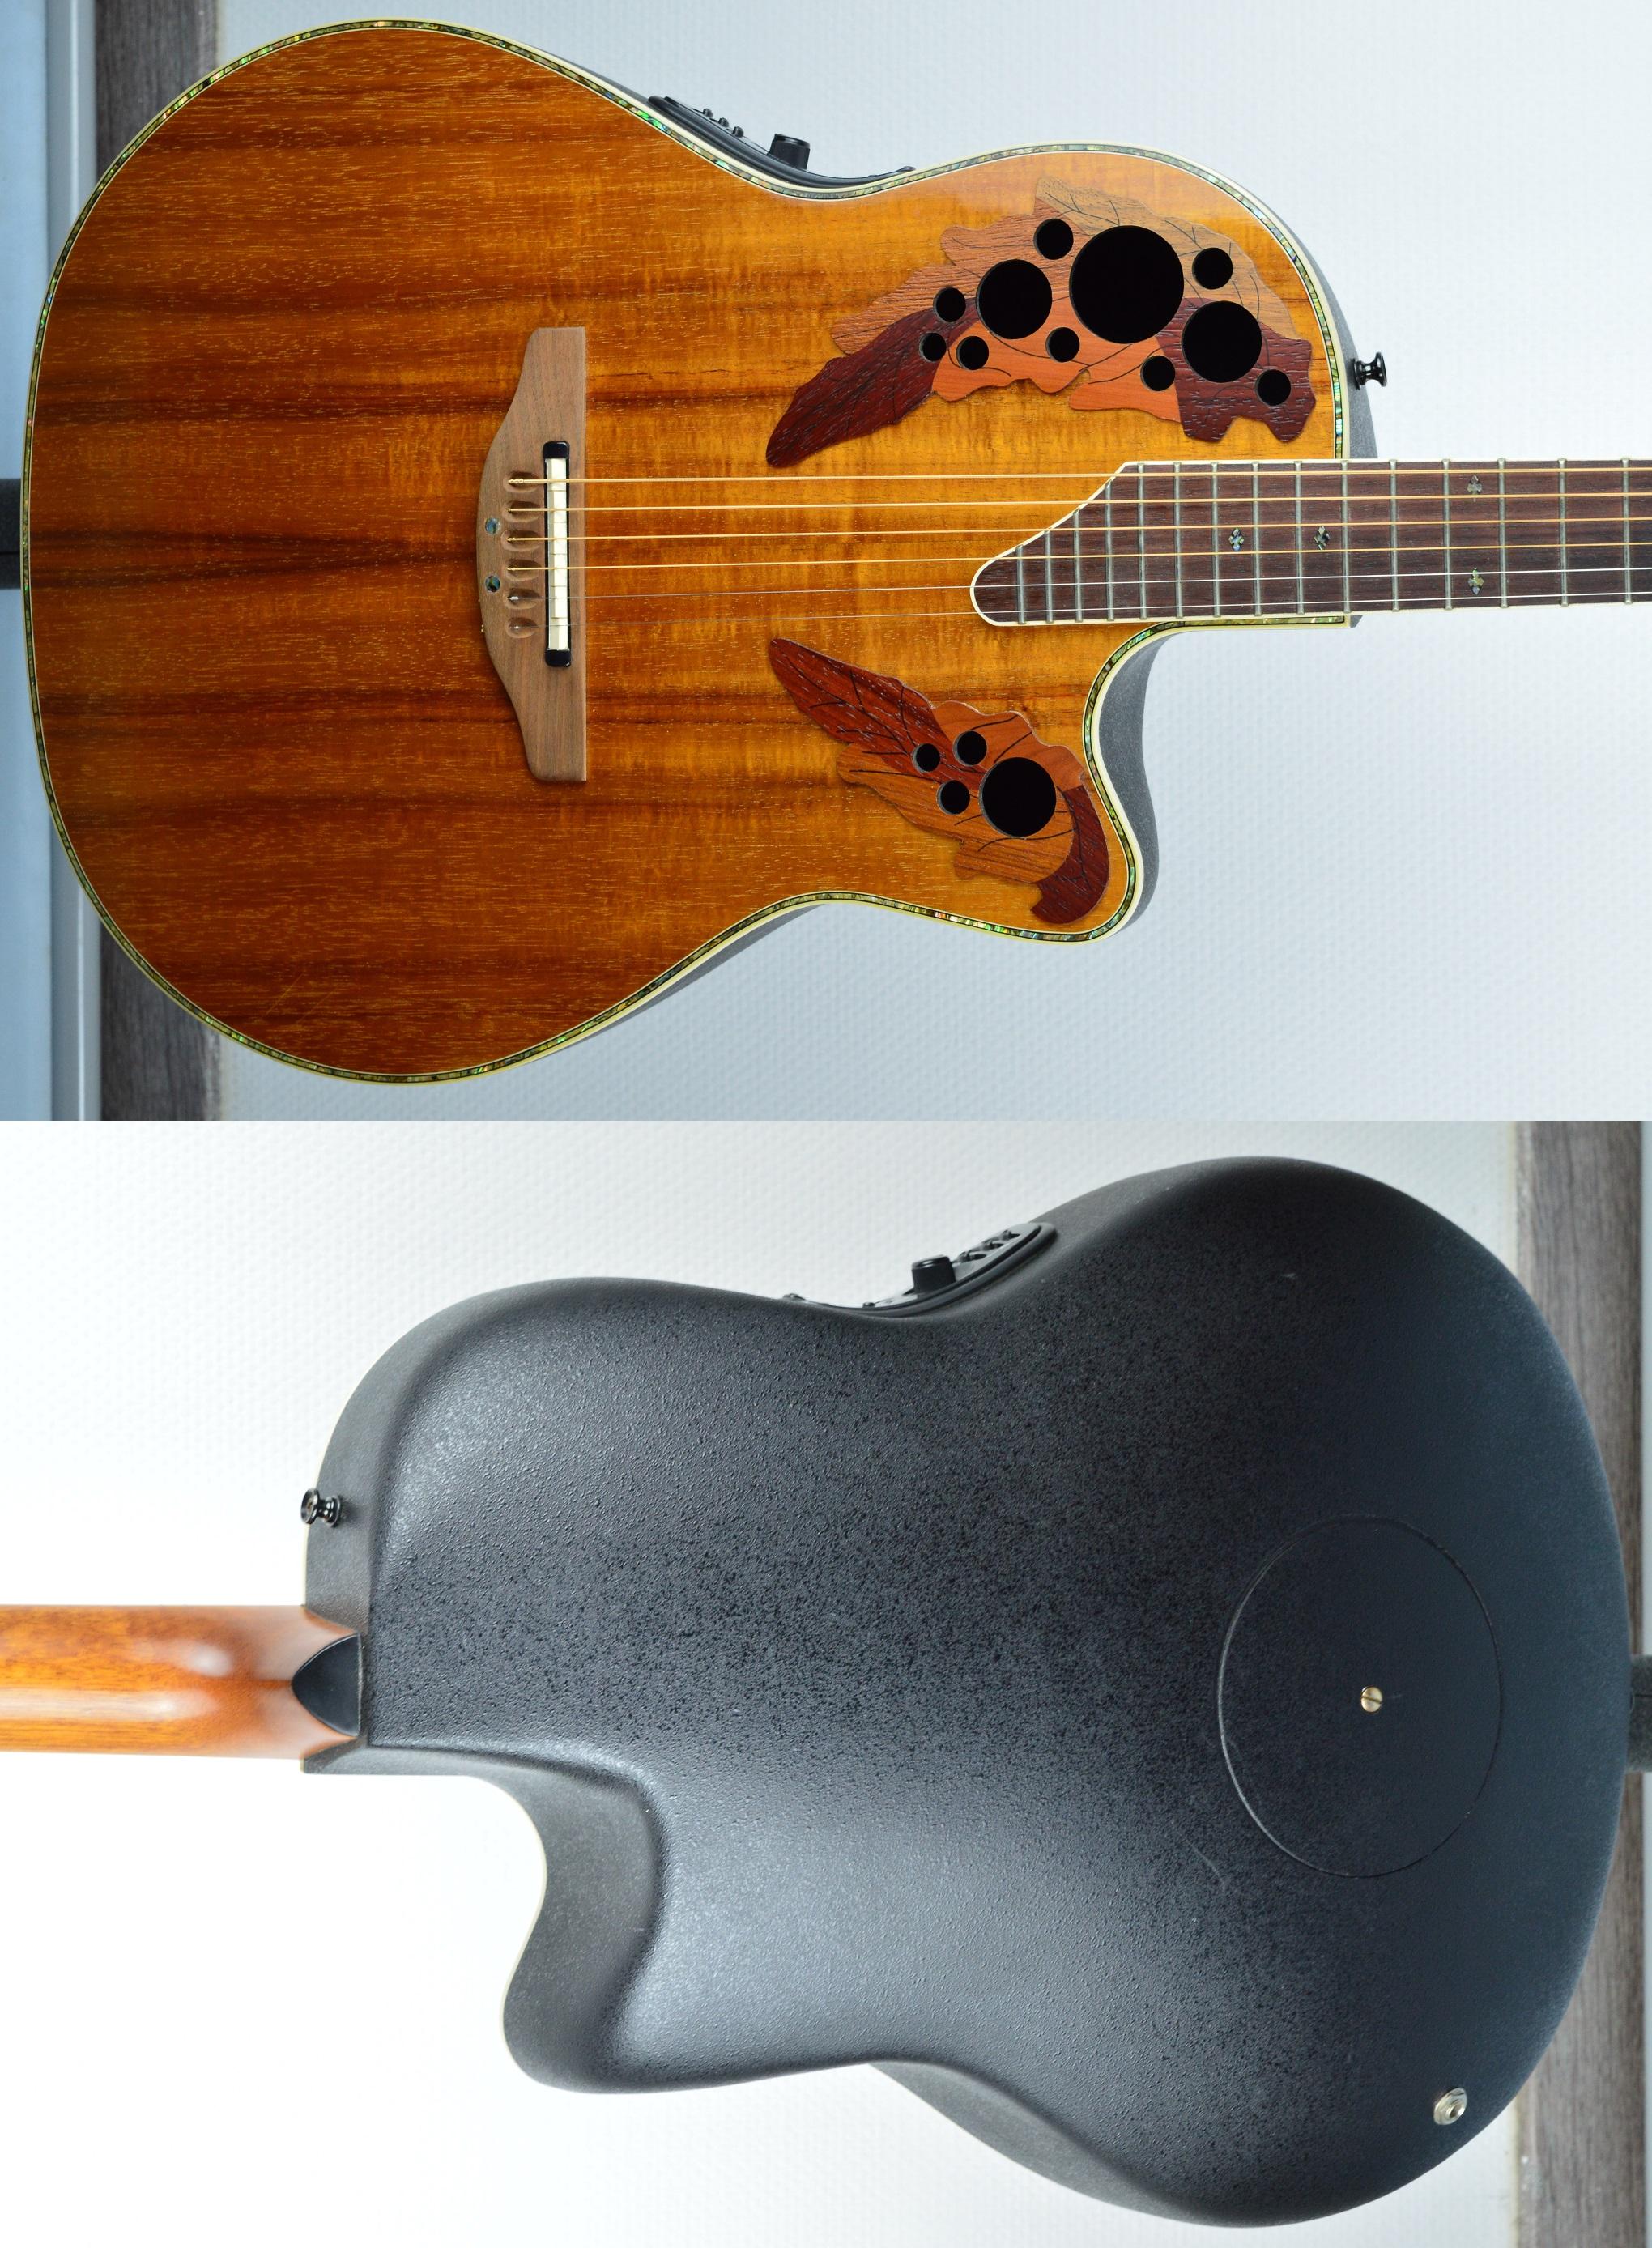 Ovation Guitars - Adirondack Guitar